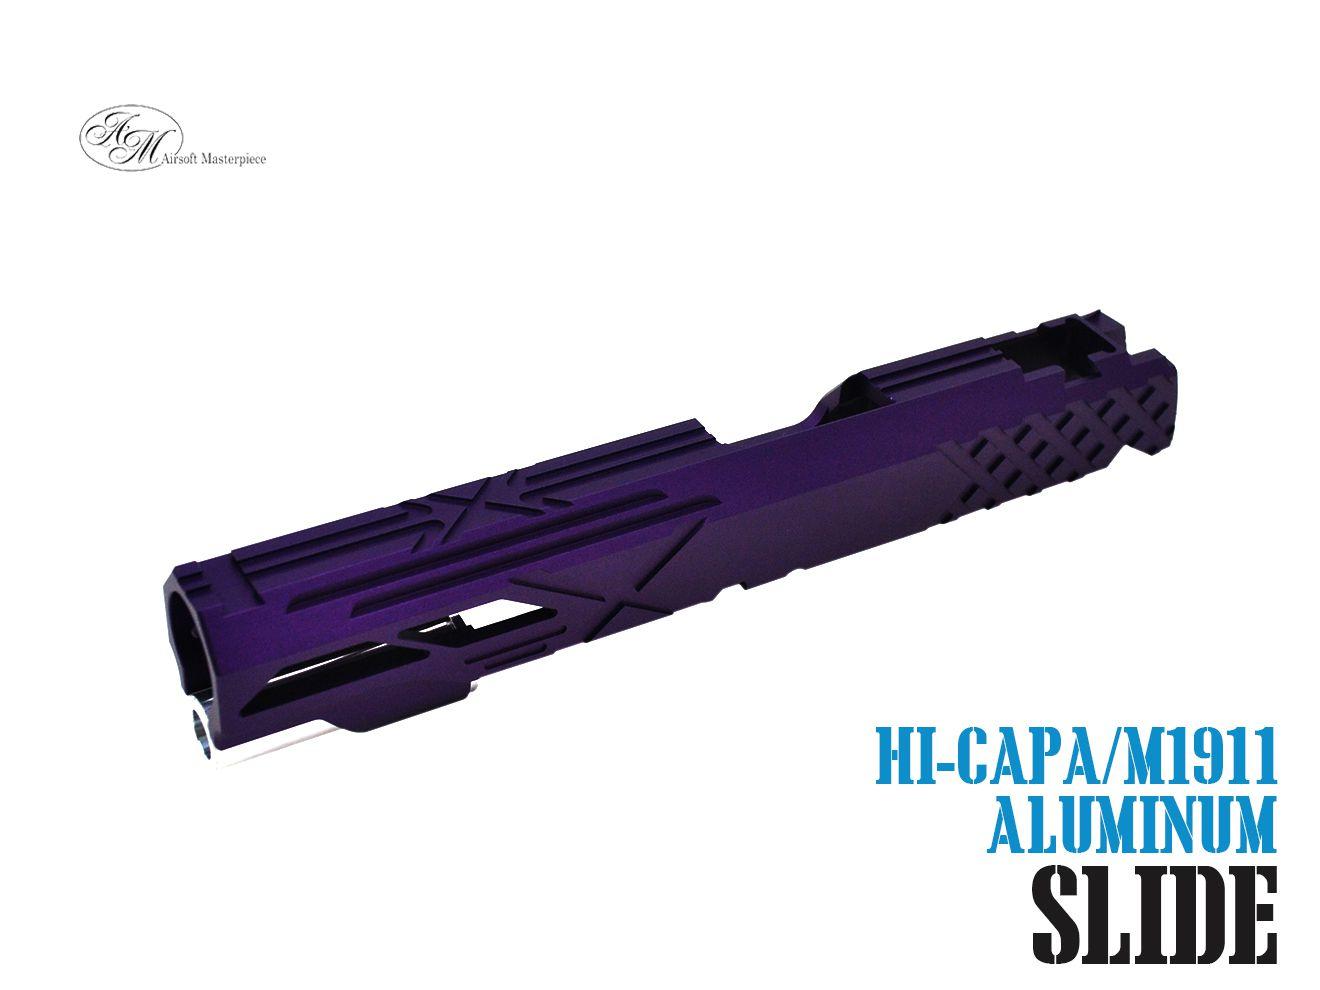 Airsoft Masterpiece Custom X2 スタンダード スライド For TM Hi-Capa/1911 GBB PP★紫 パープル マスターピース Hi-CAPA M1911 ハンドガン